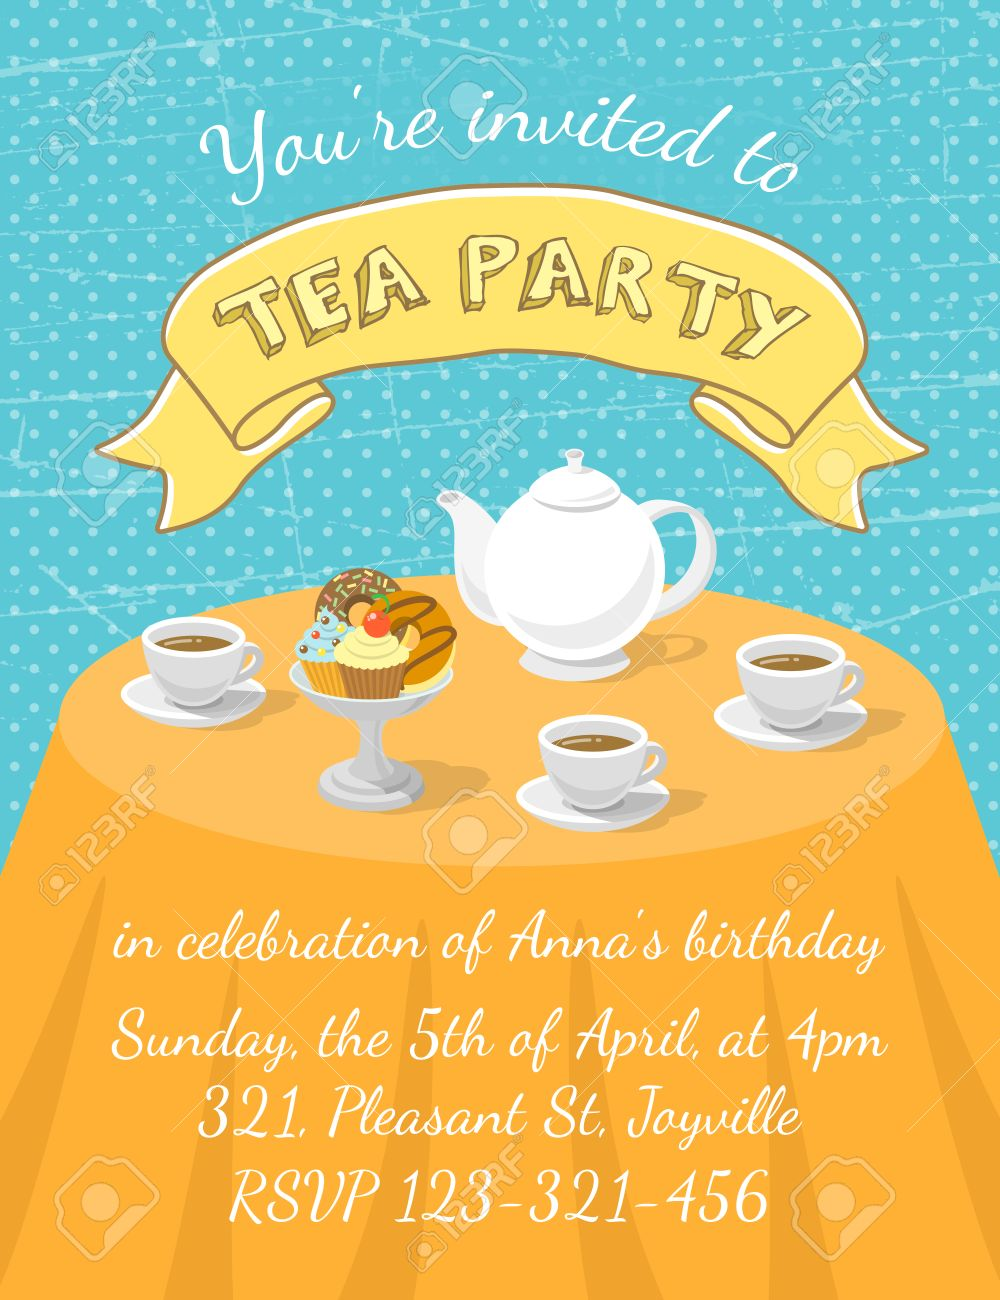 Elegant tea party invitation template with teacups cartoon vector - Modern Flat Vector Tea Party Invitation Card With Tea Cups Teapot And Dessert On The